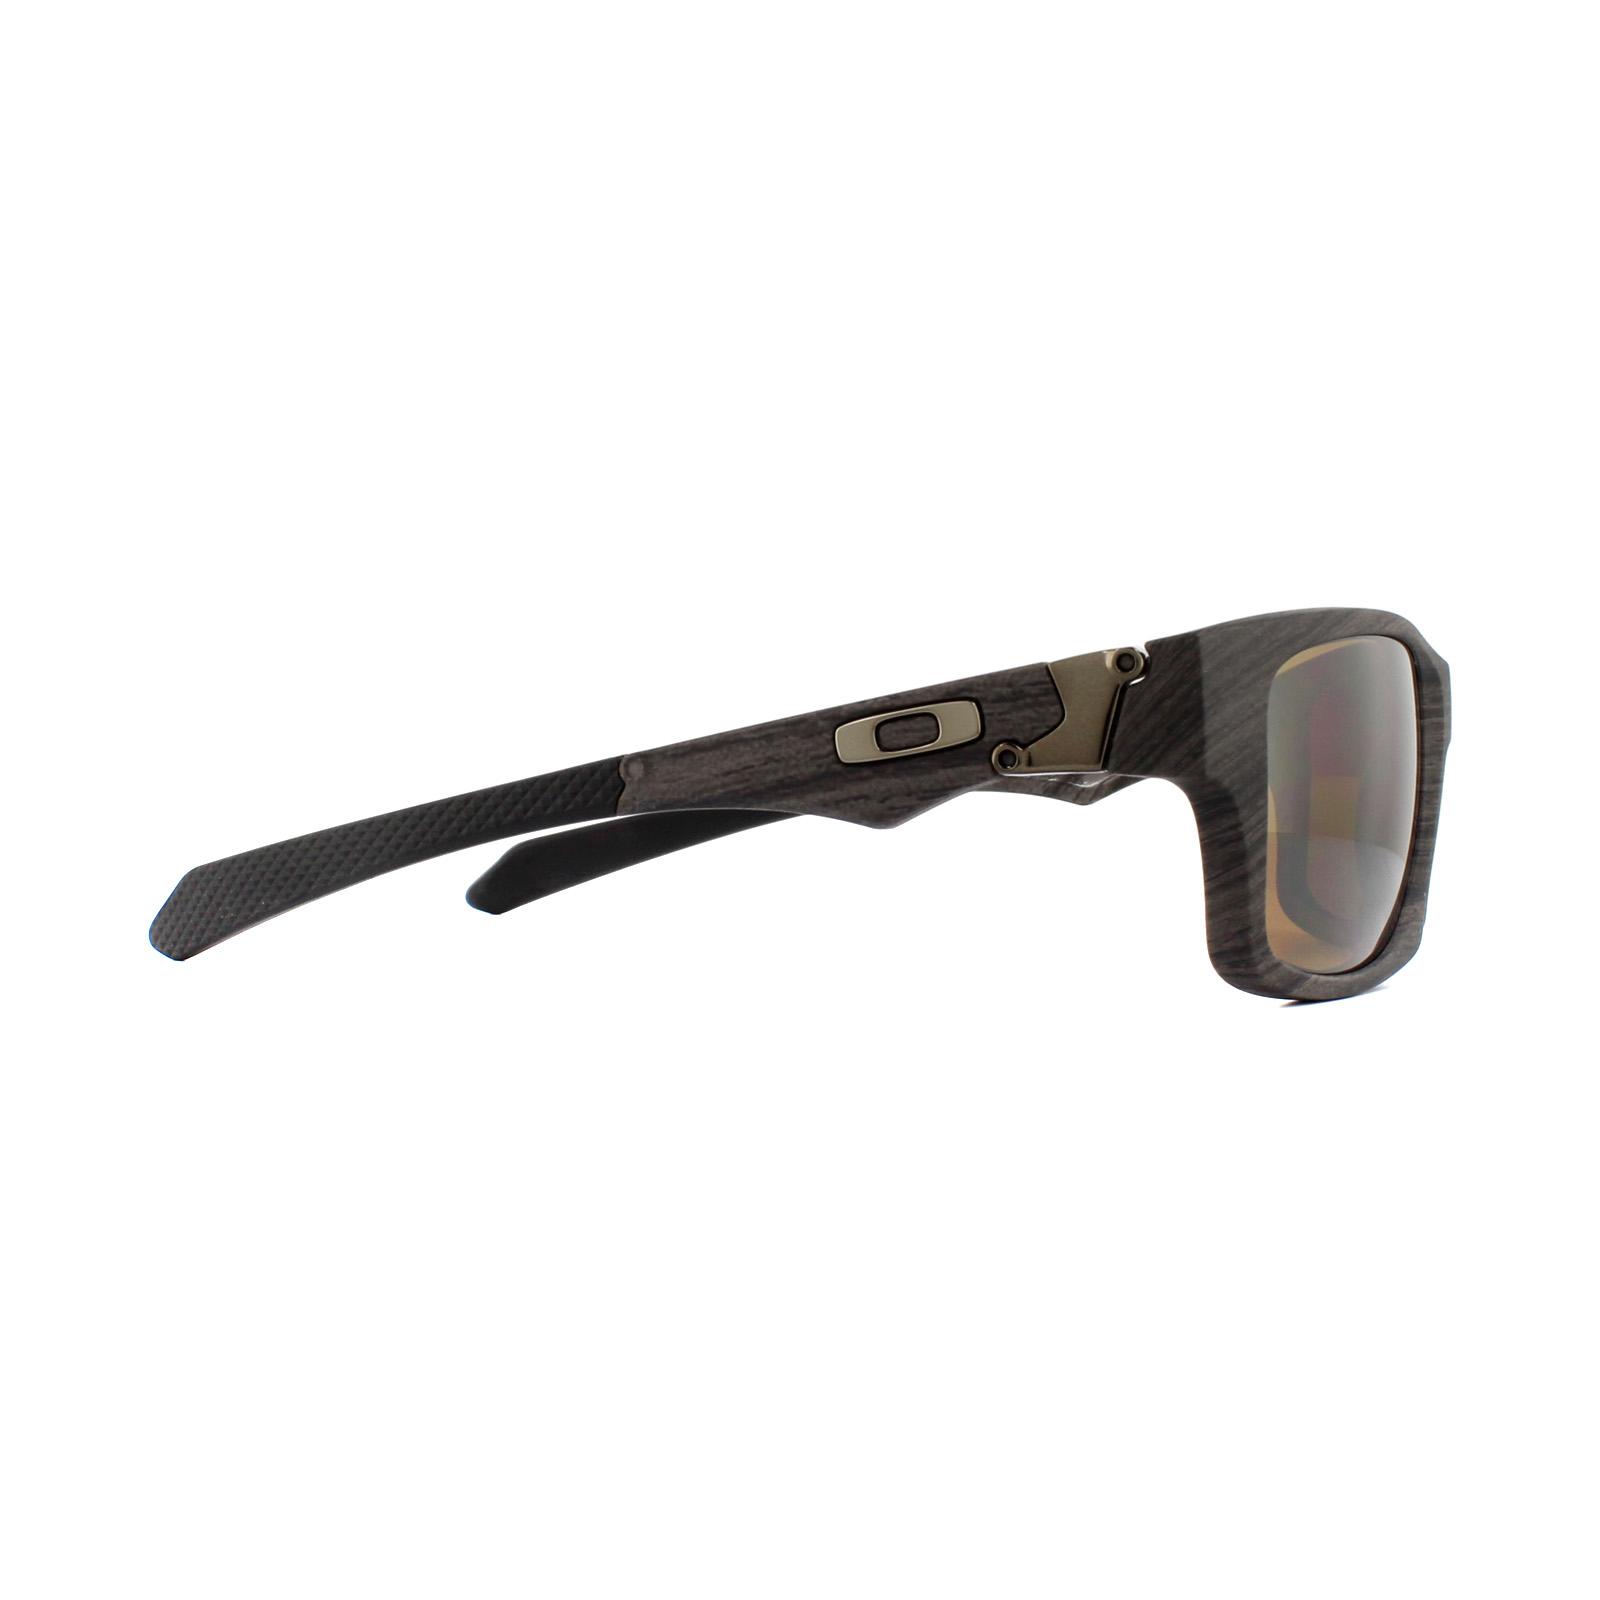 2d07aacd2b Sentinel Oakley Sunglasses Jupiter Squared OO9135-35 Woodgrain Prizm  Tungsten Polarized